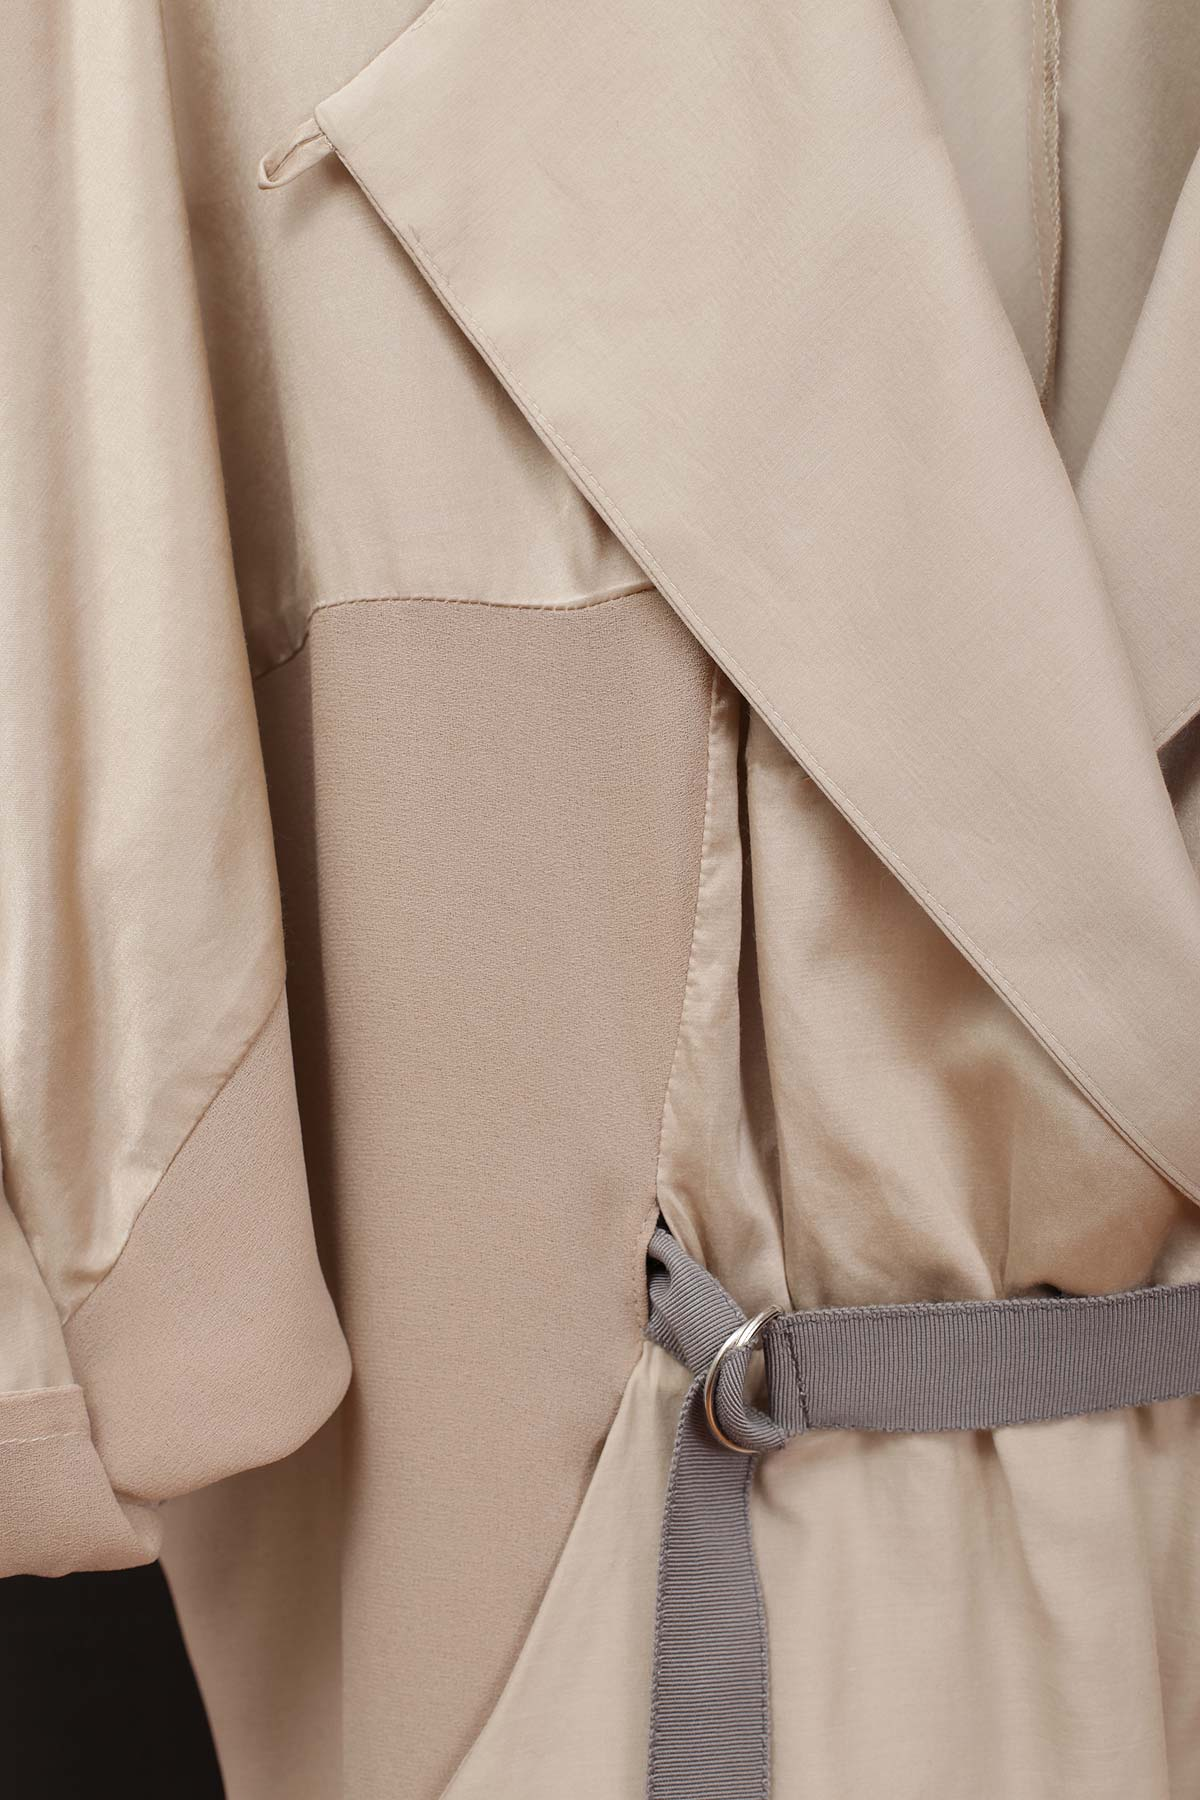 Paula Immich Kimonokleid aus Seide-Baumwolle mit Ripps-Gürtel